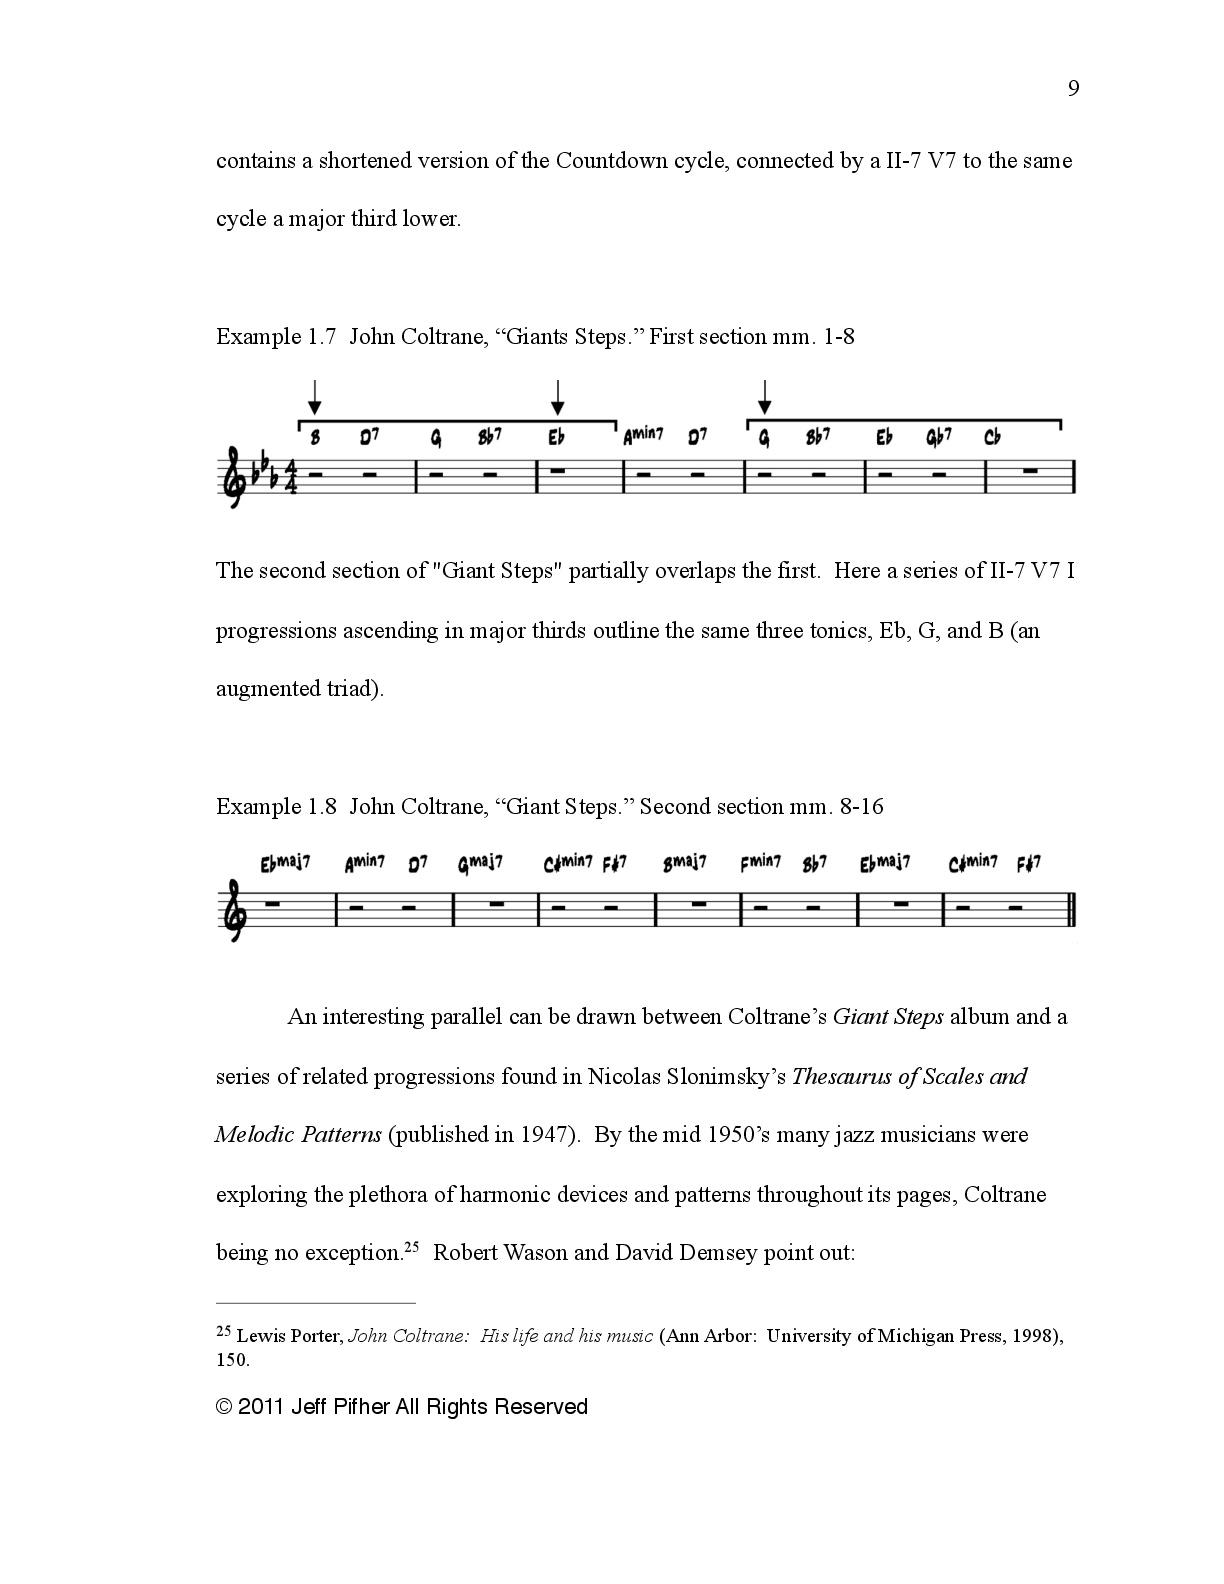 Jeff-Pifher-Academic-Series-Coltrane-Cycles-009.jpg